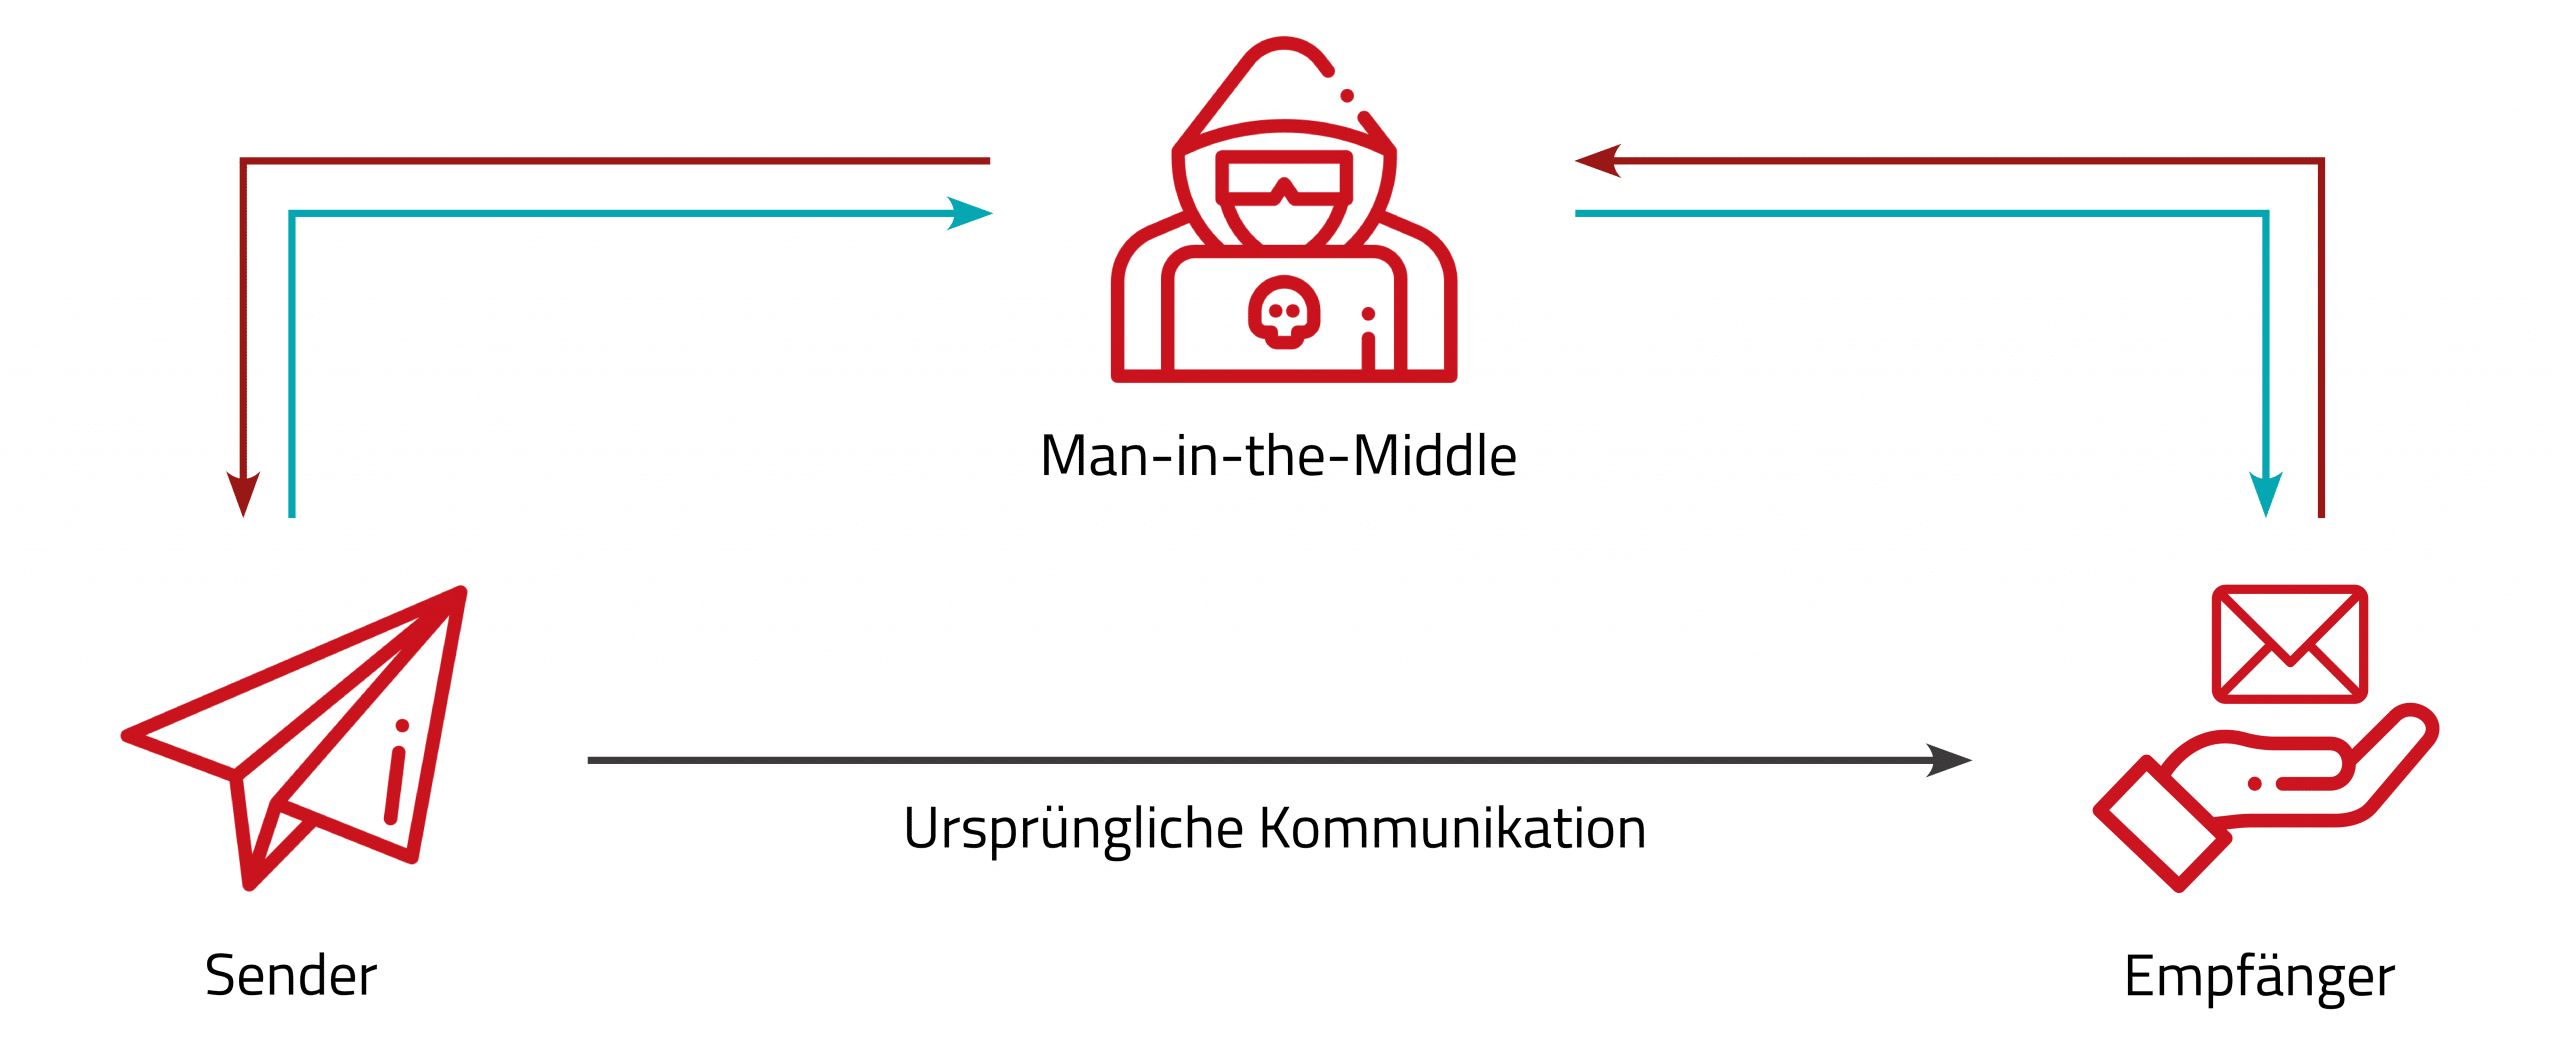 Cyber-Angriff Sender-Empfänger-Modell